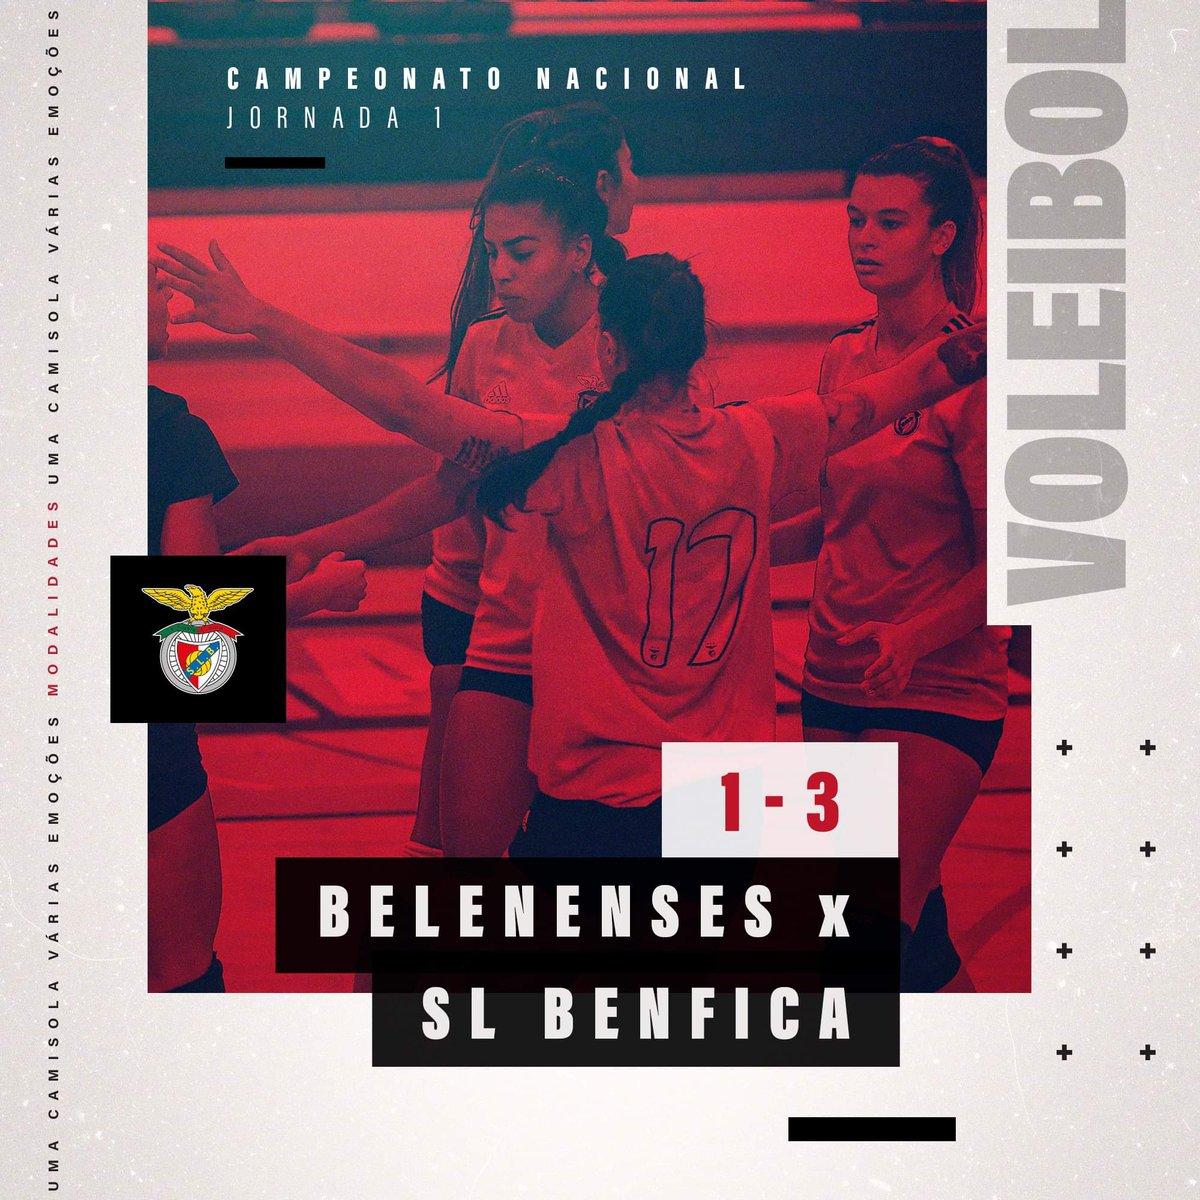 🏐♀️ #liga #jornada1 #CFBSLB #PrimeiroLugar https://t.co/UYRmHkCYwN